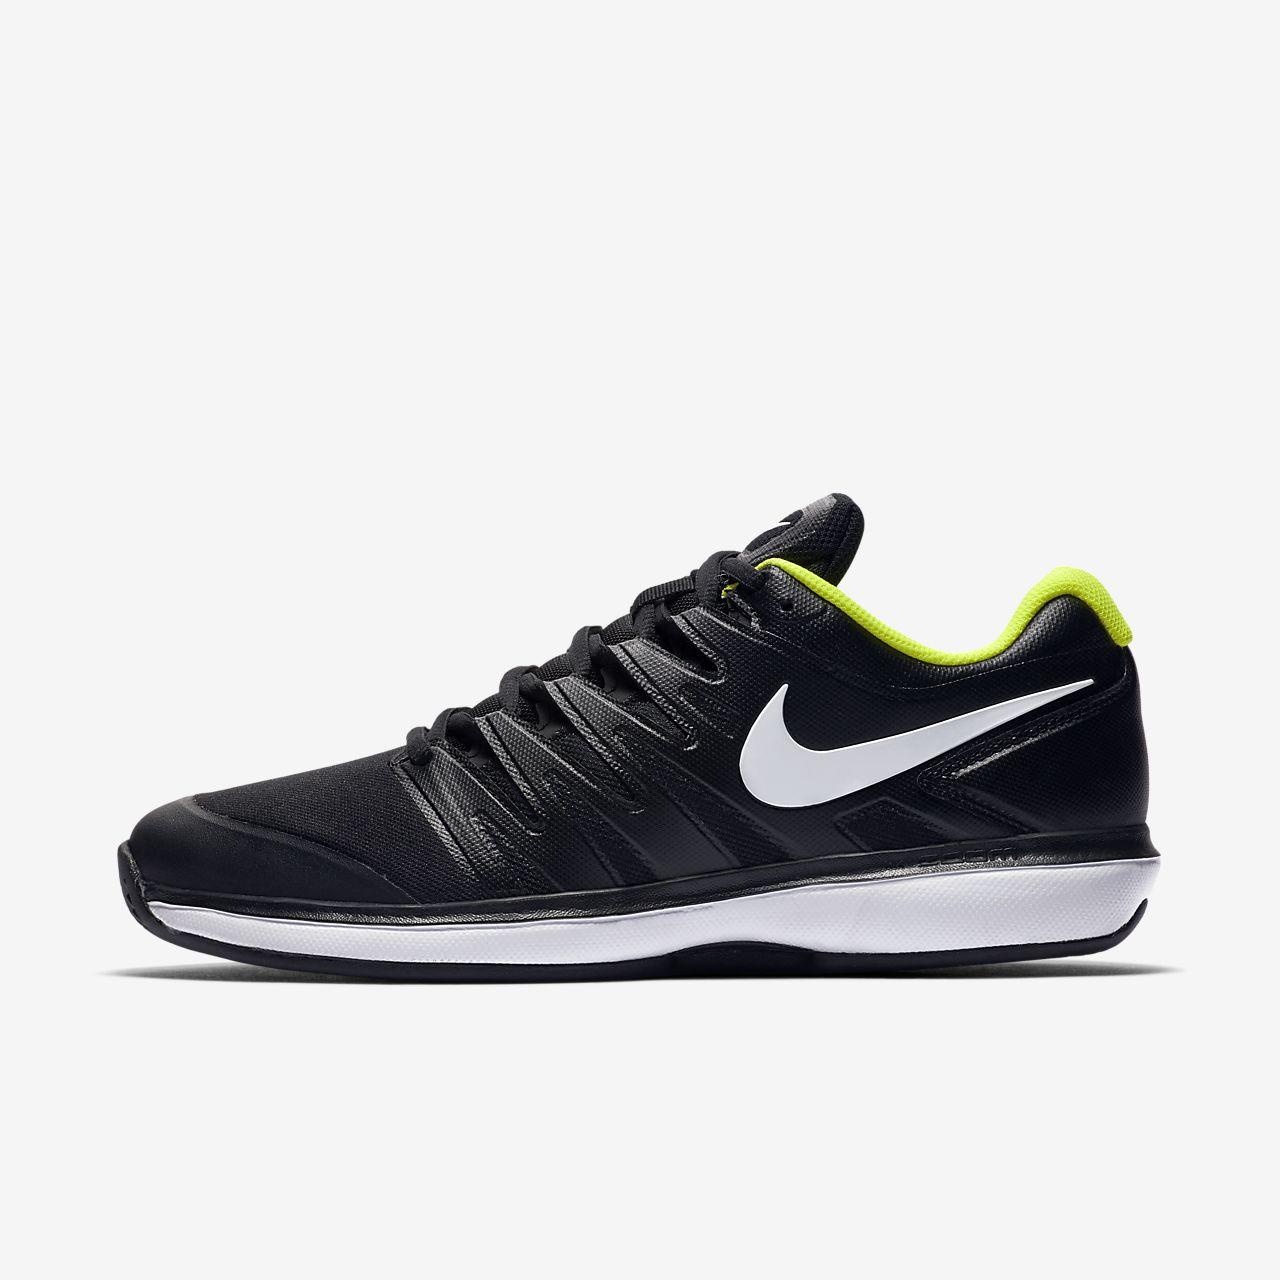 Scarpa da tennis per campi in terra rossa NikeCourt Air Zoom Prestige Uomo